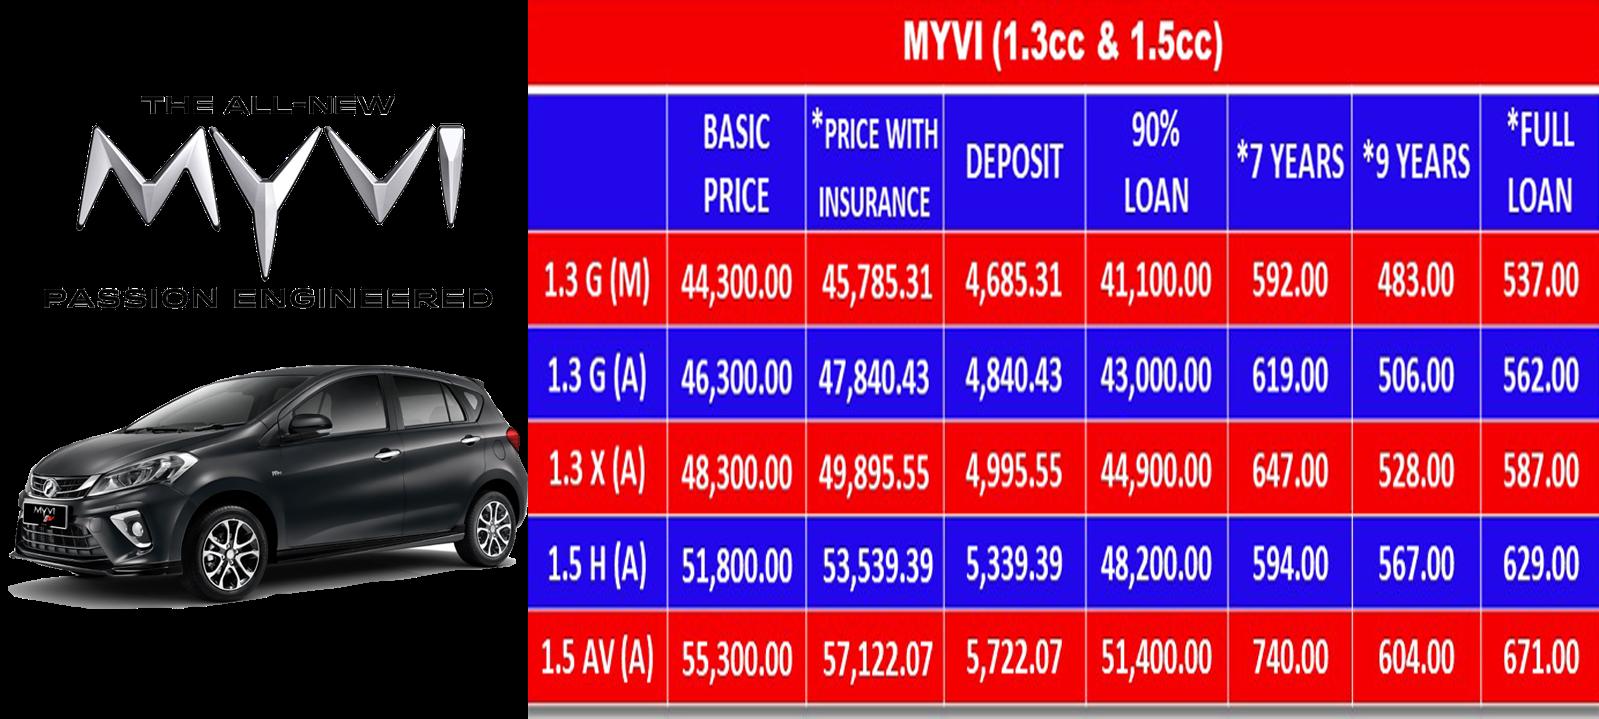 Perodua Car Sales Promosi April 2018 - PeroduaCarSales.Com